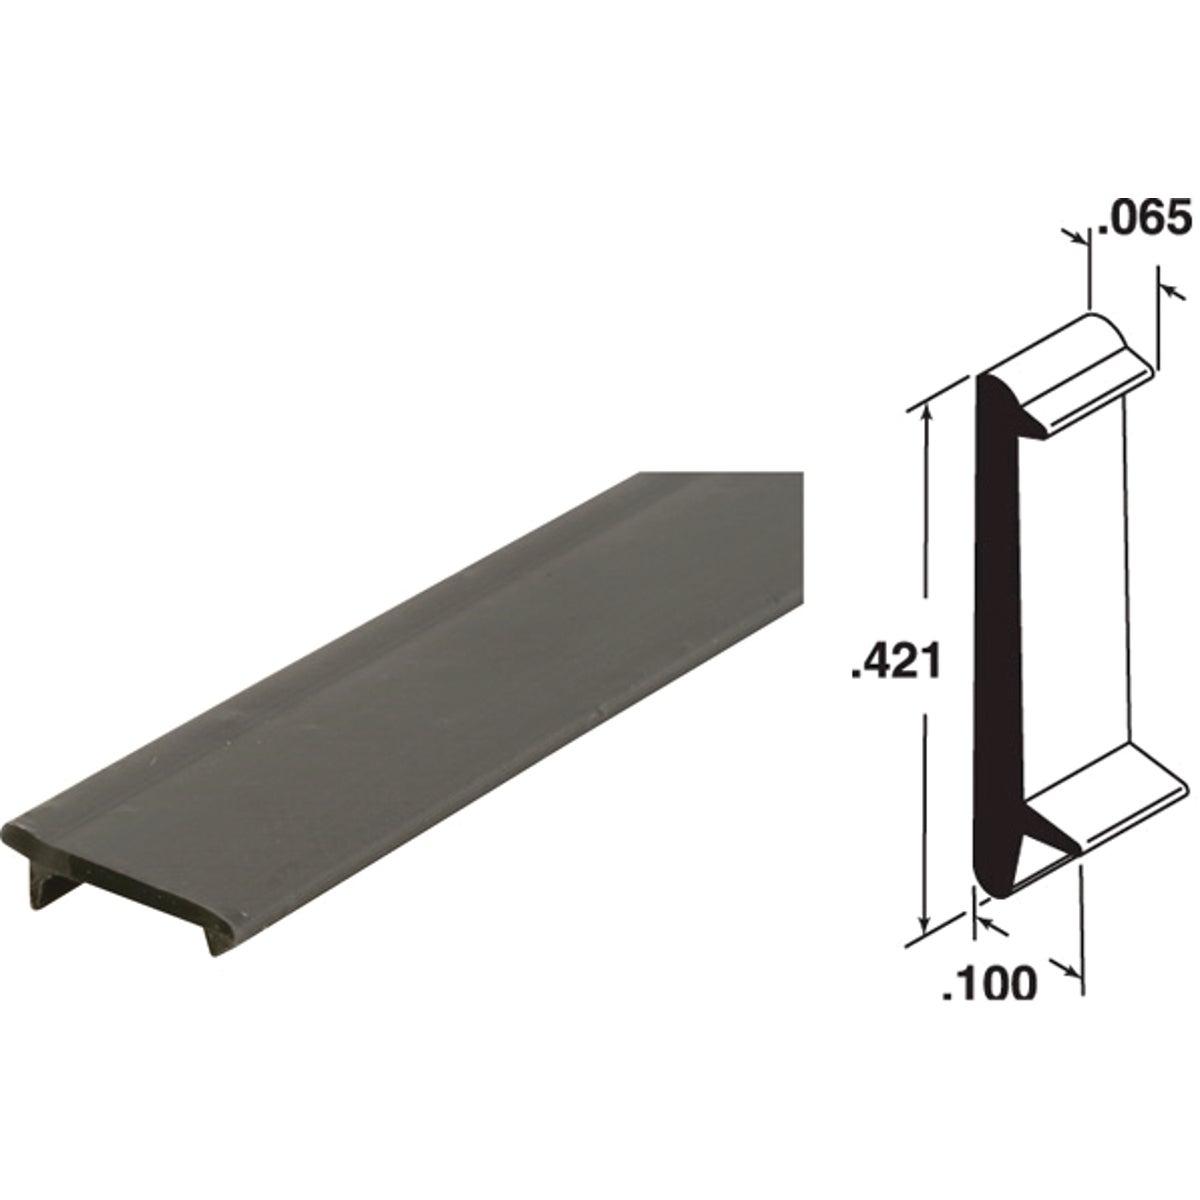 "80"" RIGID SCREEN SPLINE - P8167 by Prime Line Products"